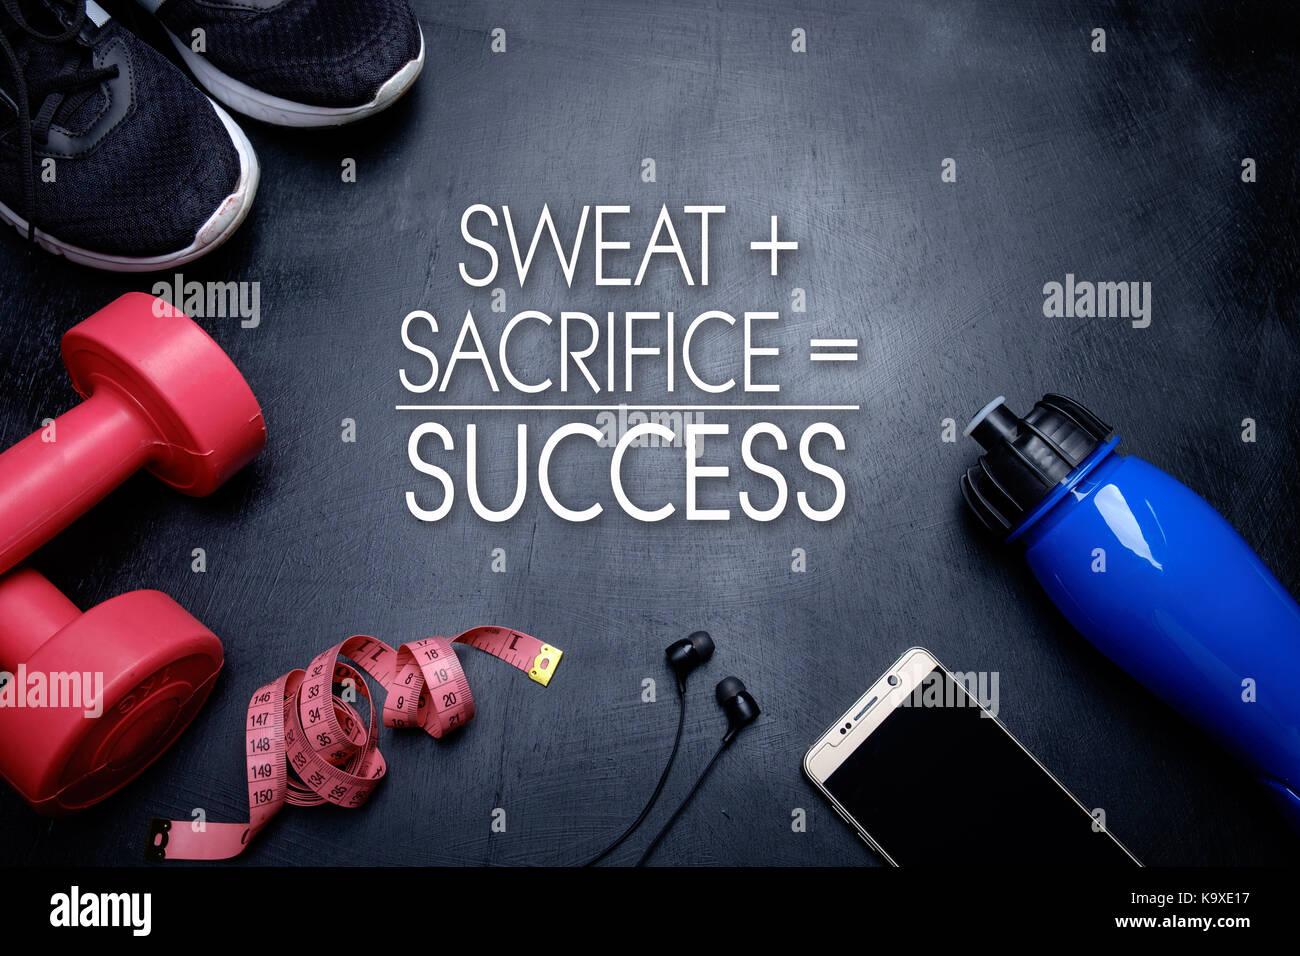 Sweat Sacrifice Success Health Fitness Motivational Quotes